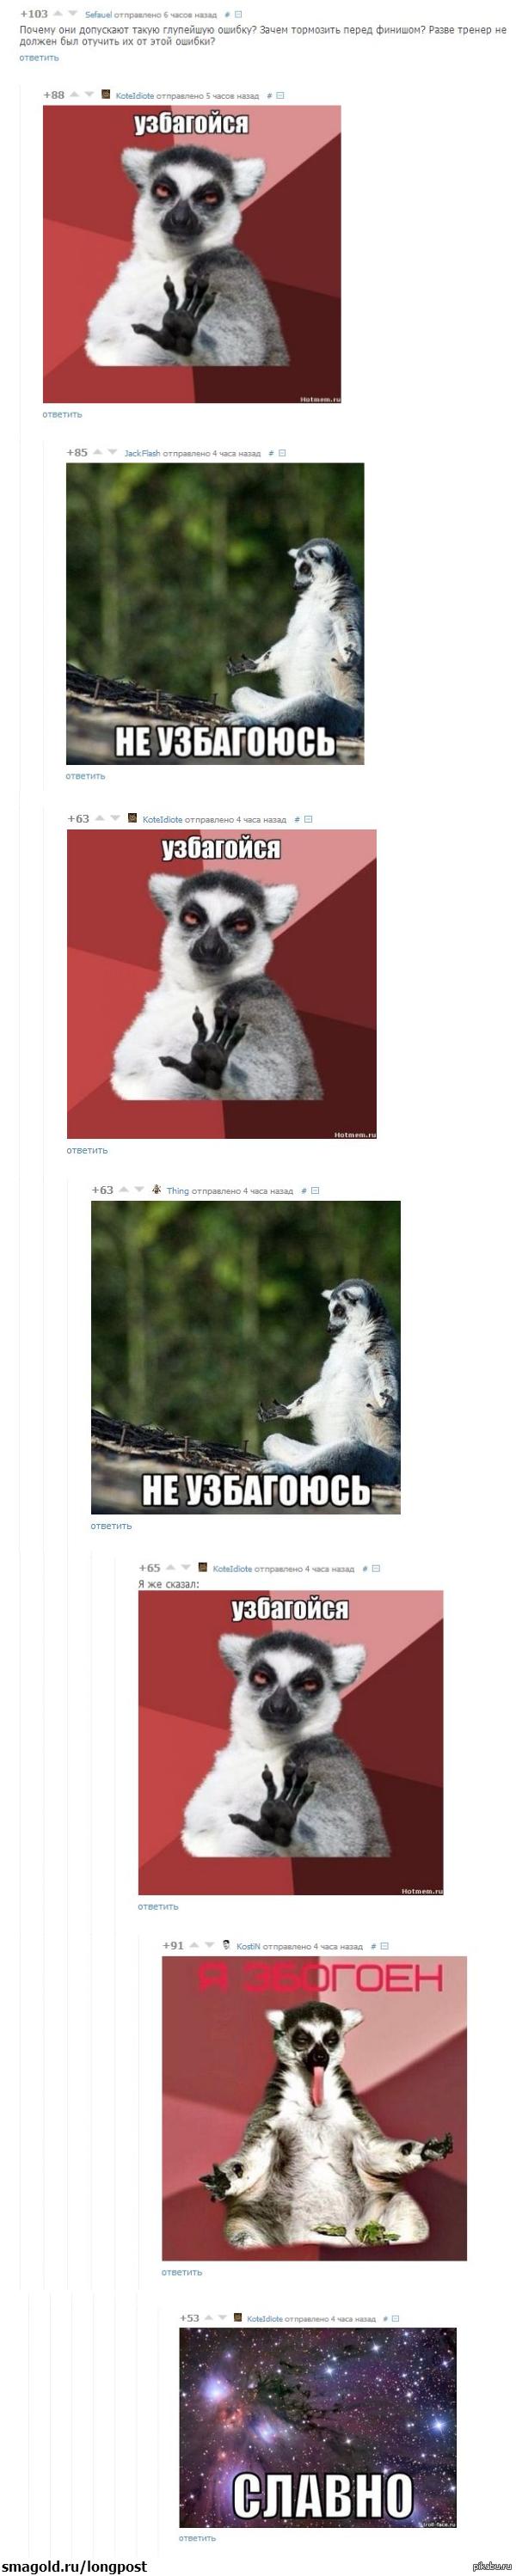 "��������� �� <a href=""http://pikabu.ru/story/ne_govori_gop_1514639"">http://pikabu.ru/story/_1514639</a>  ���������, �� ���������, �����������, ����������"